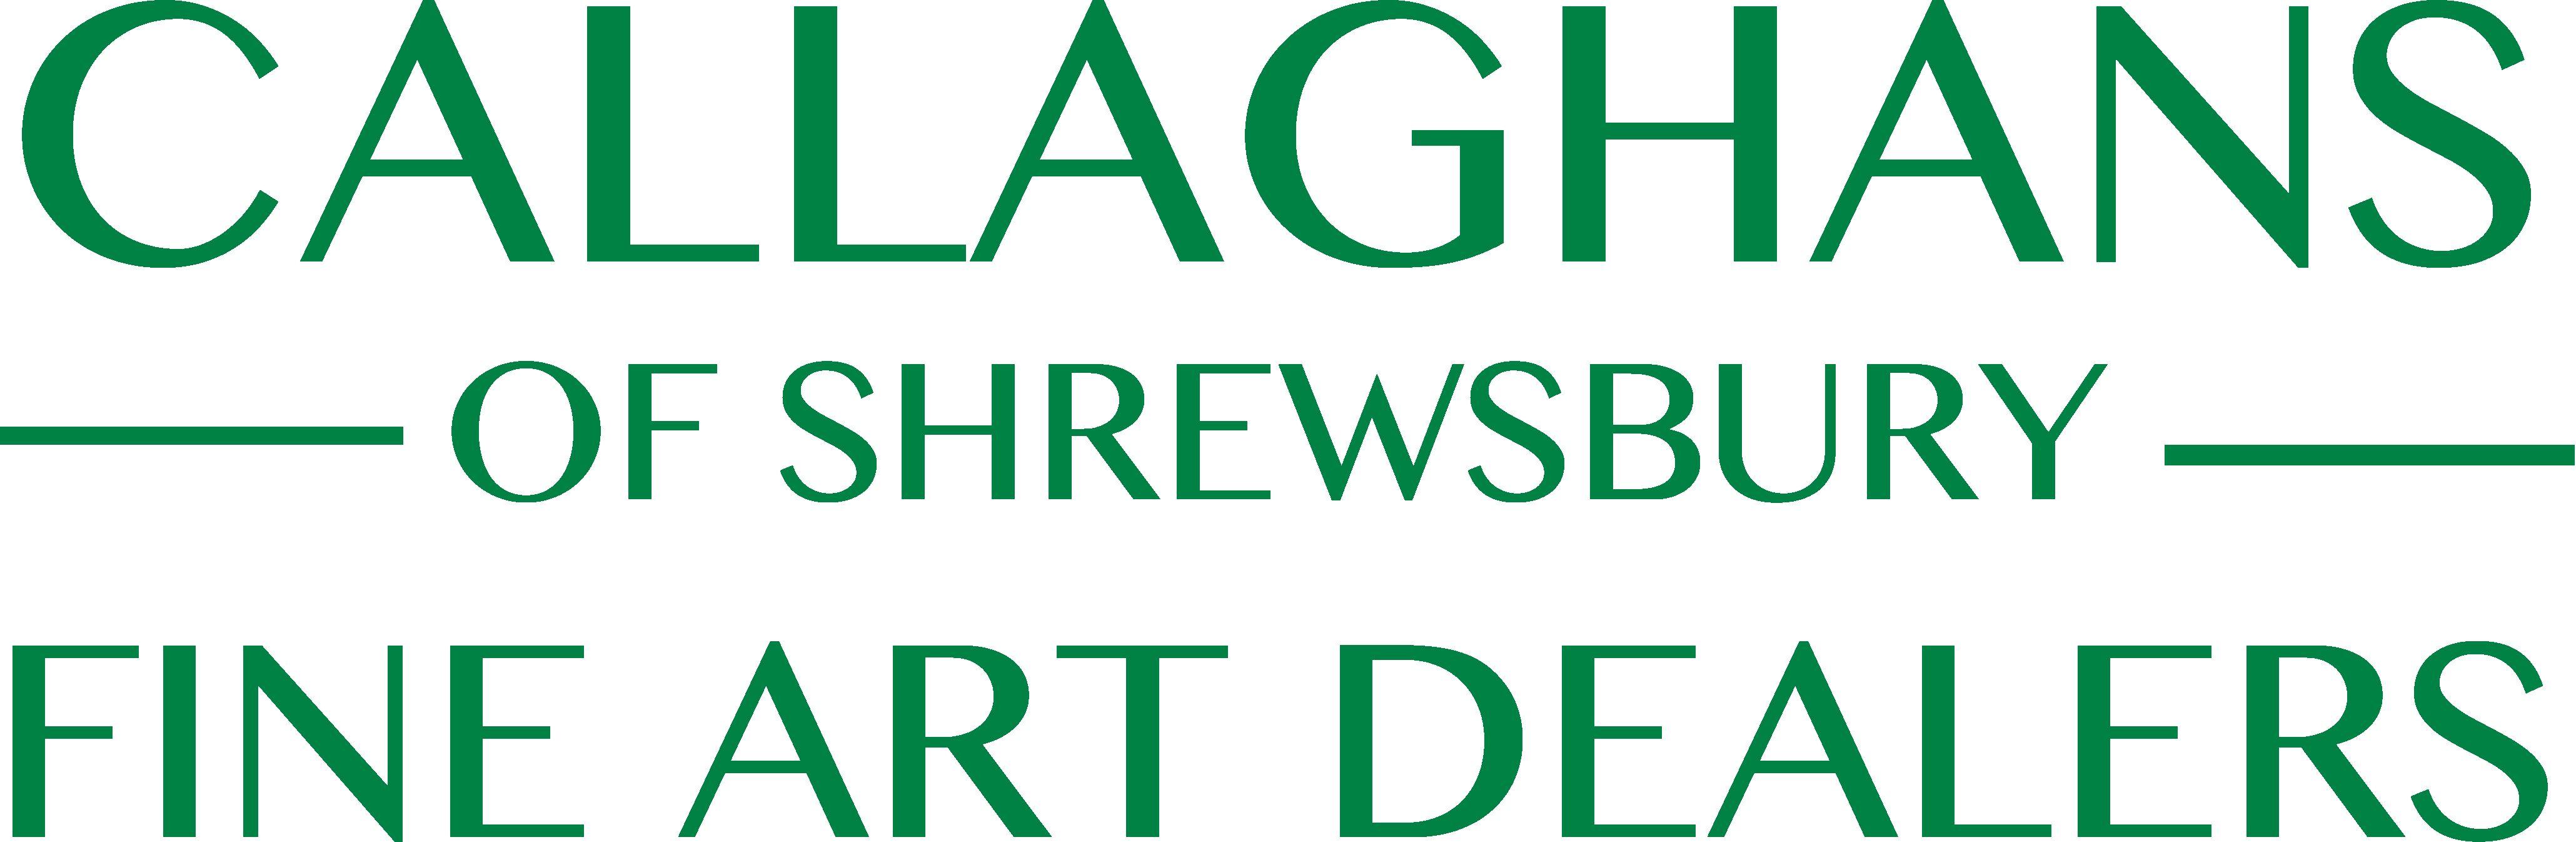 Callaghans of Shrewsbury